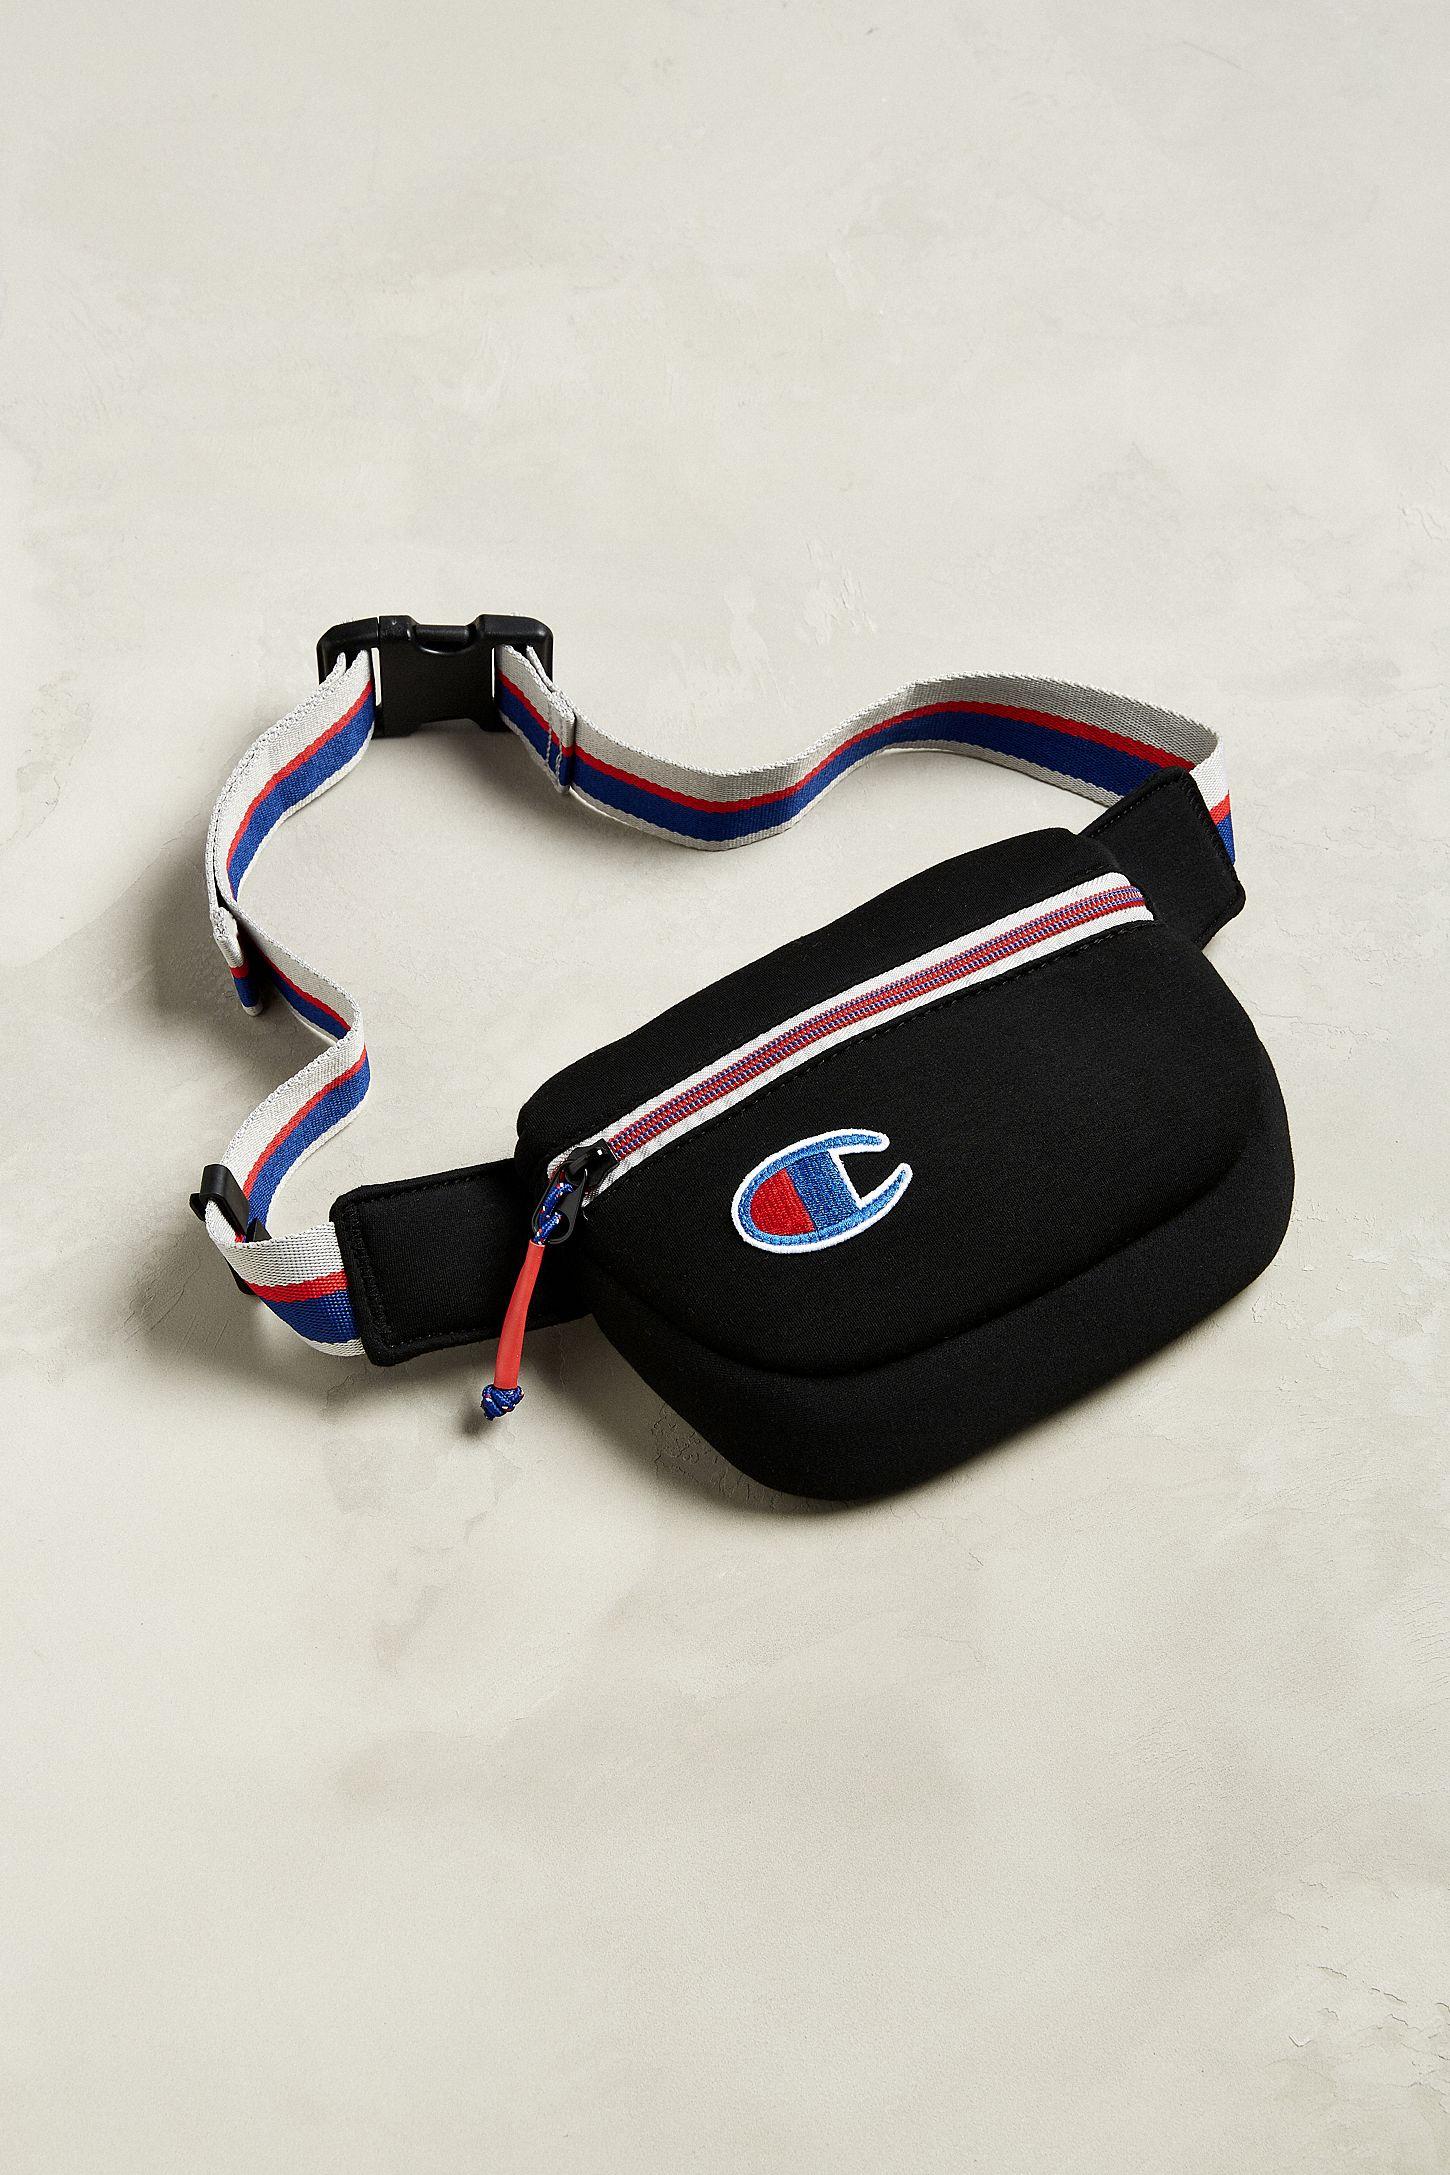 6ef0e655a976 Champion Attribute Sling Bag